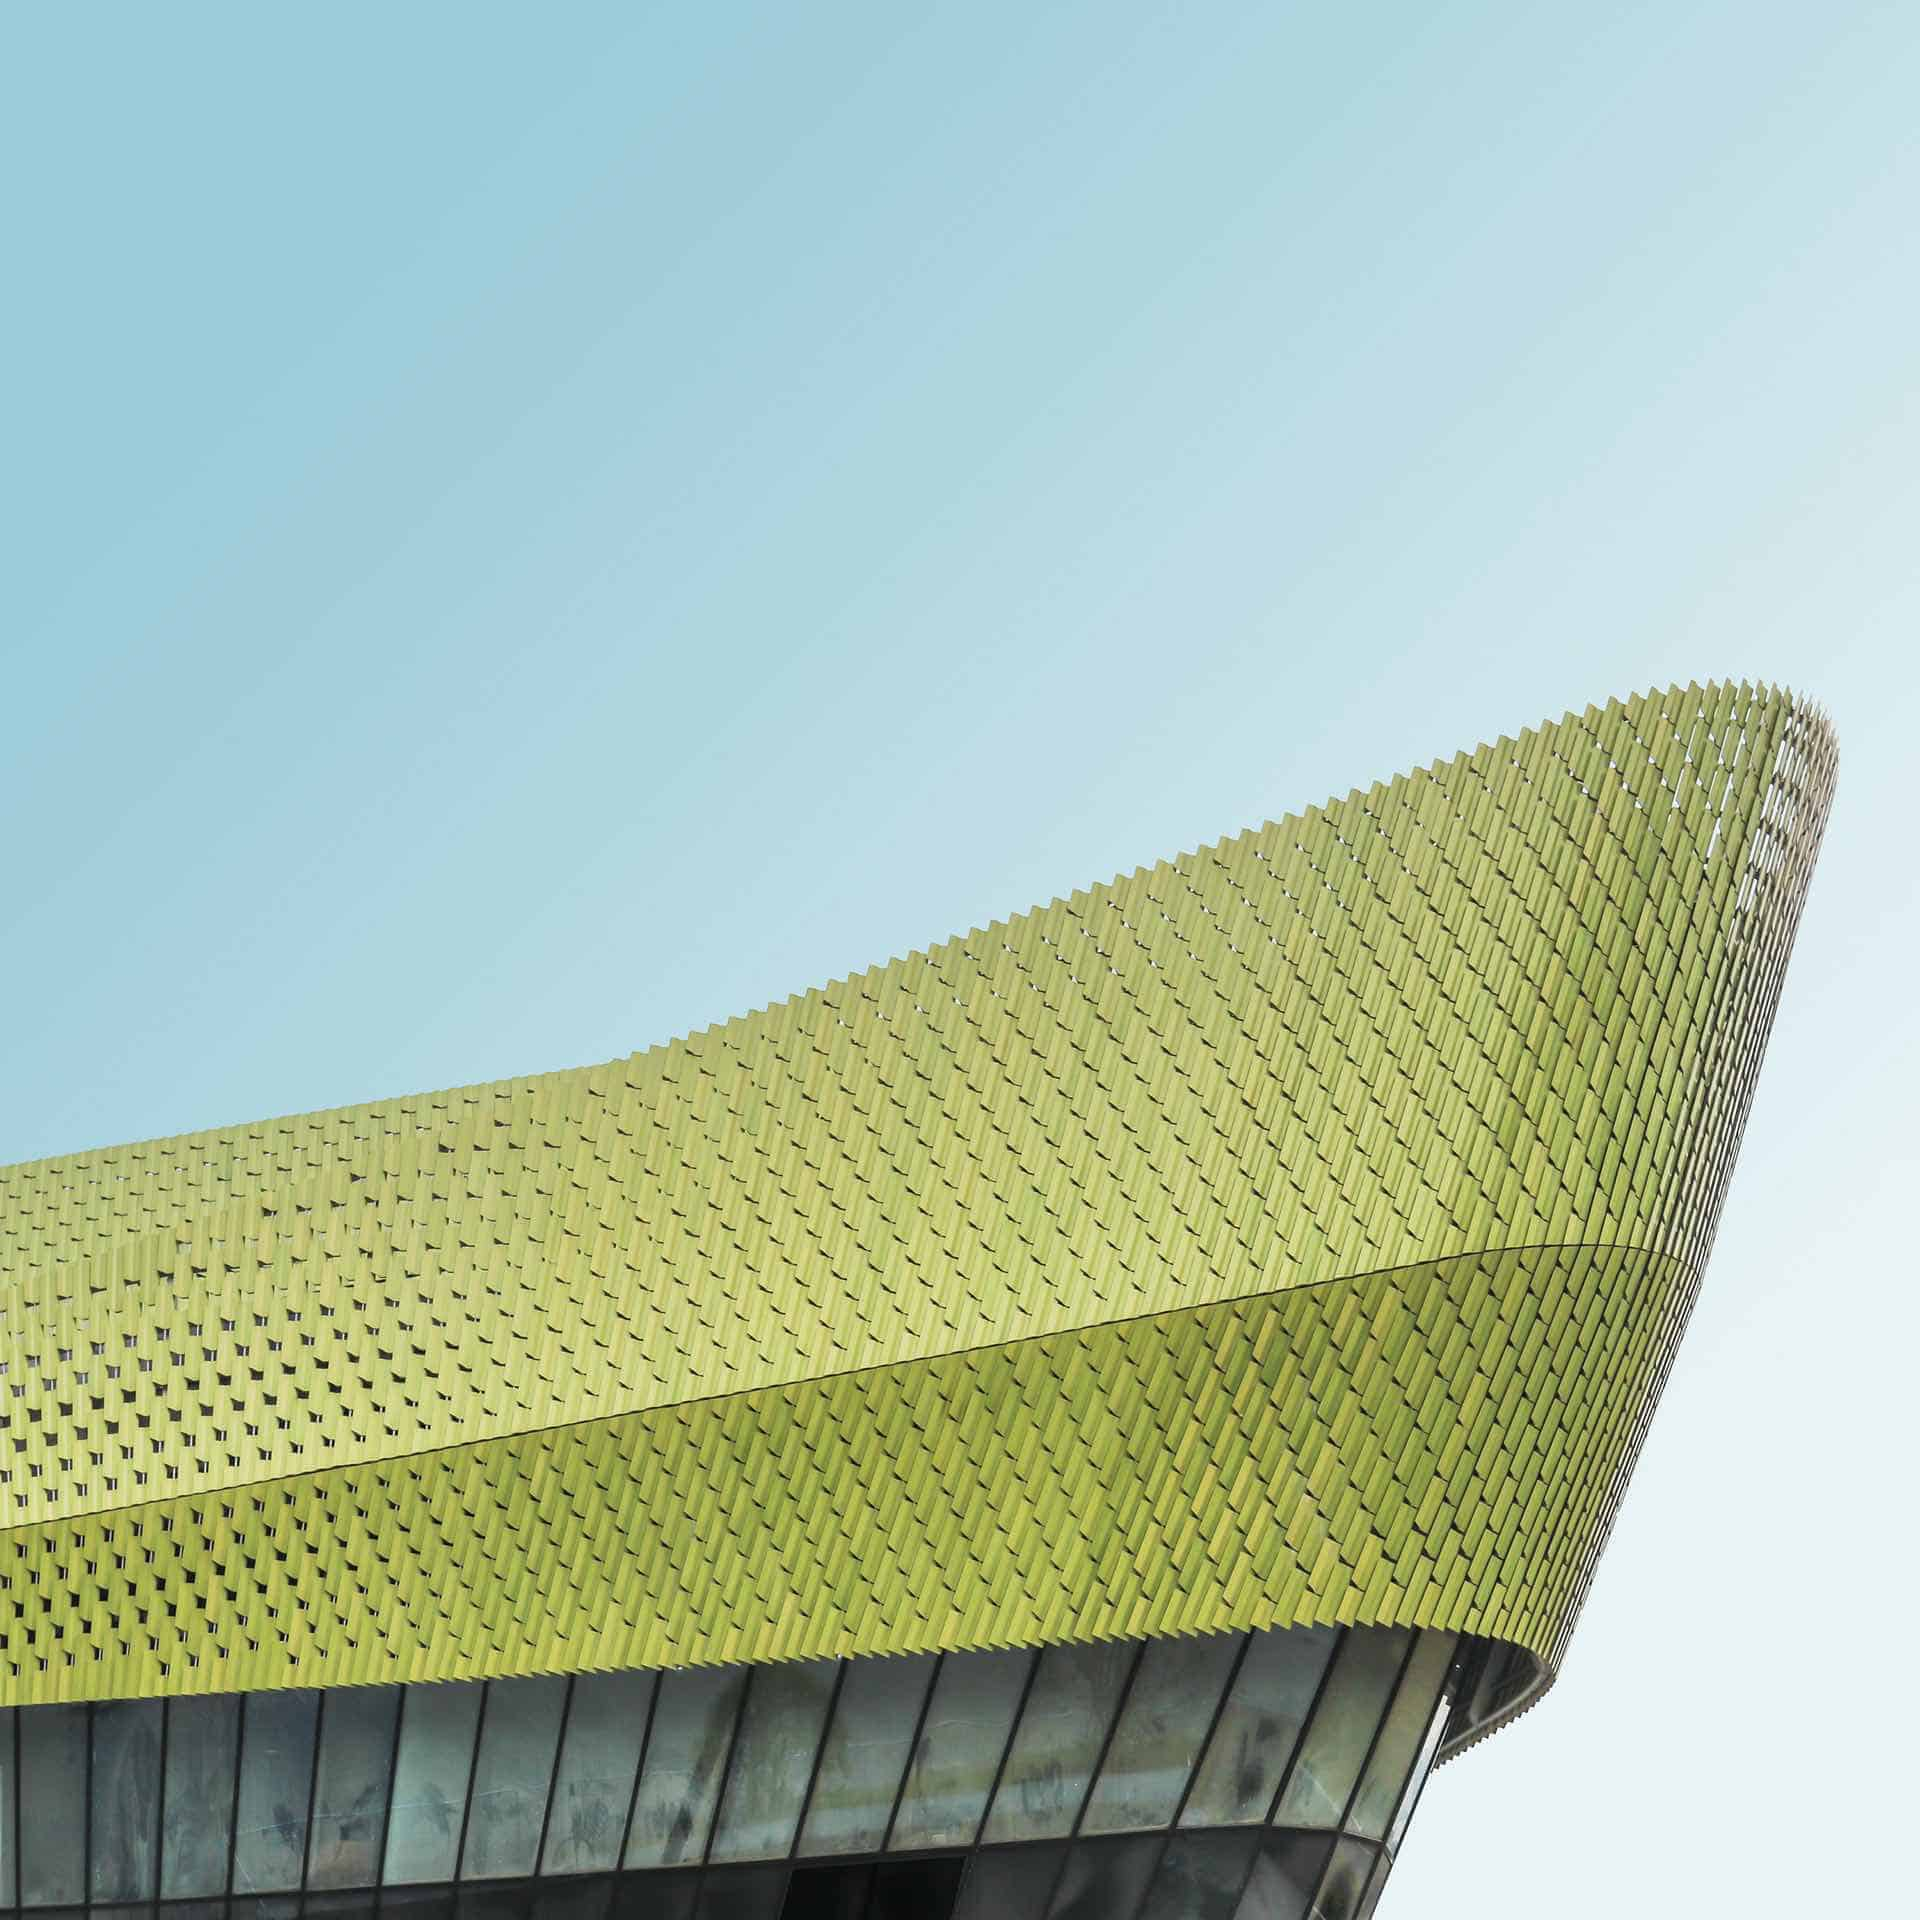 Moderne architectuur in China